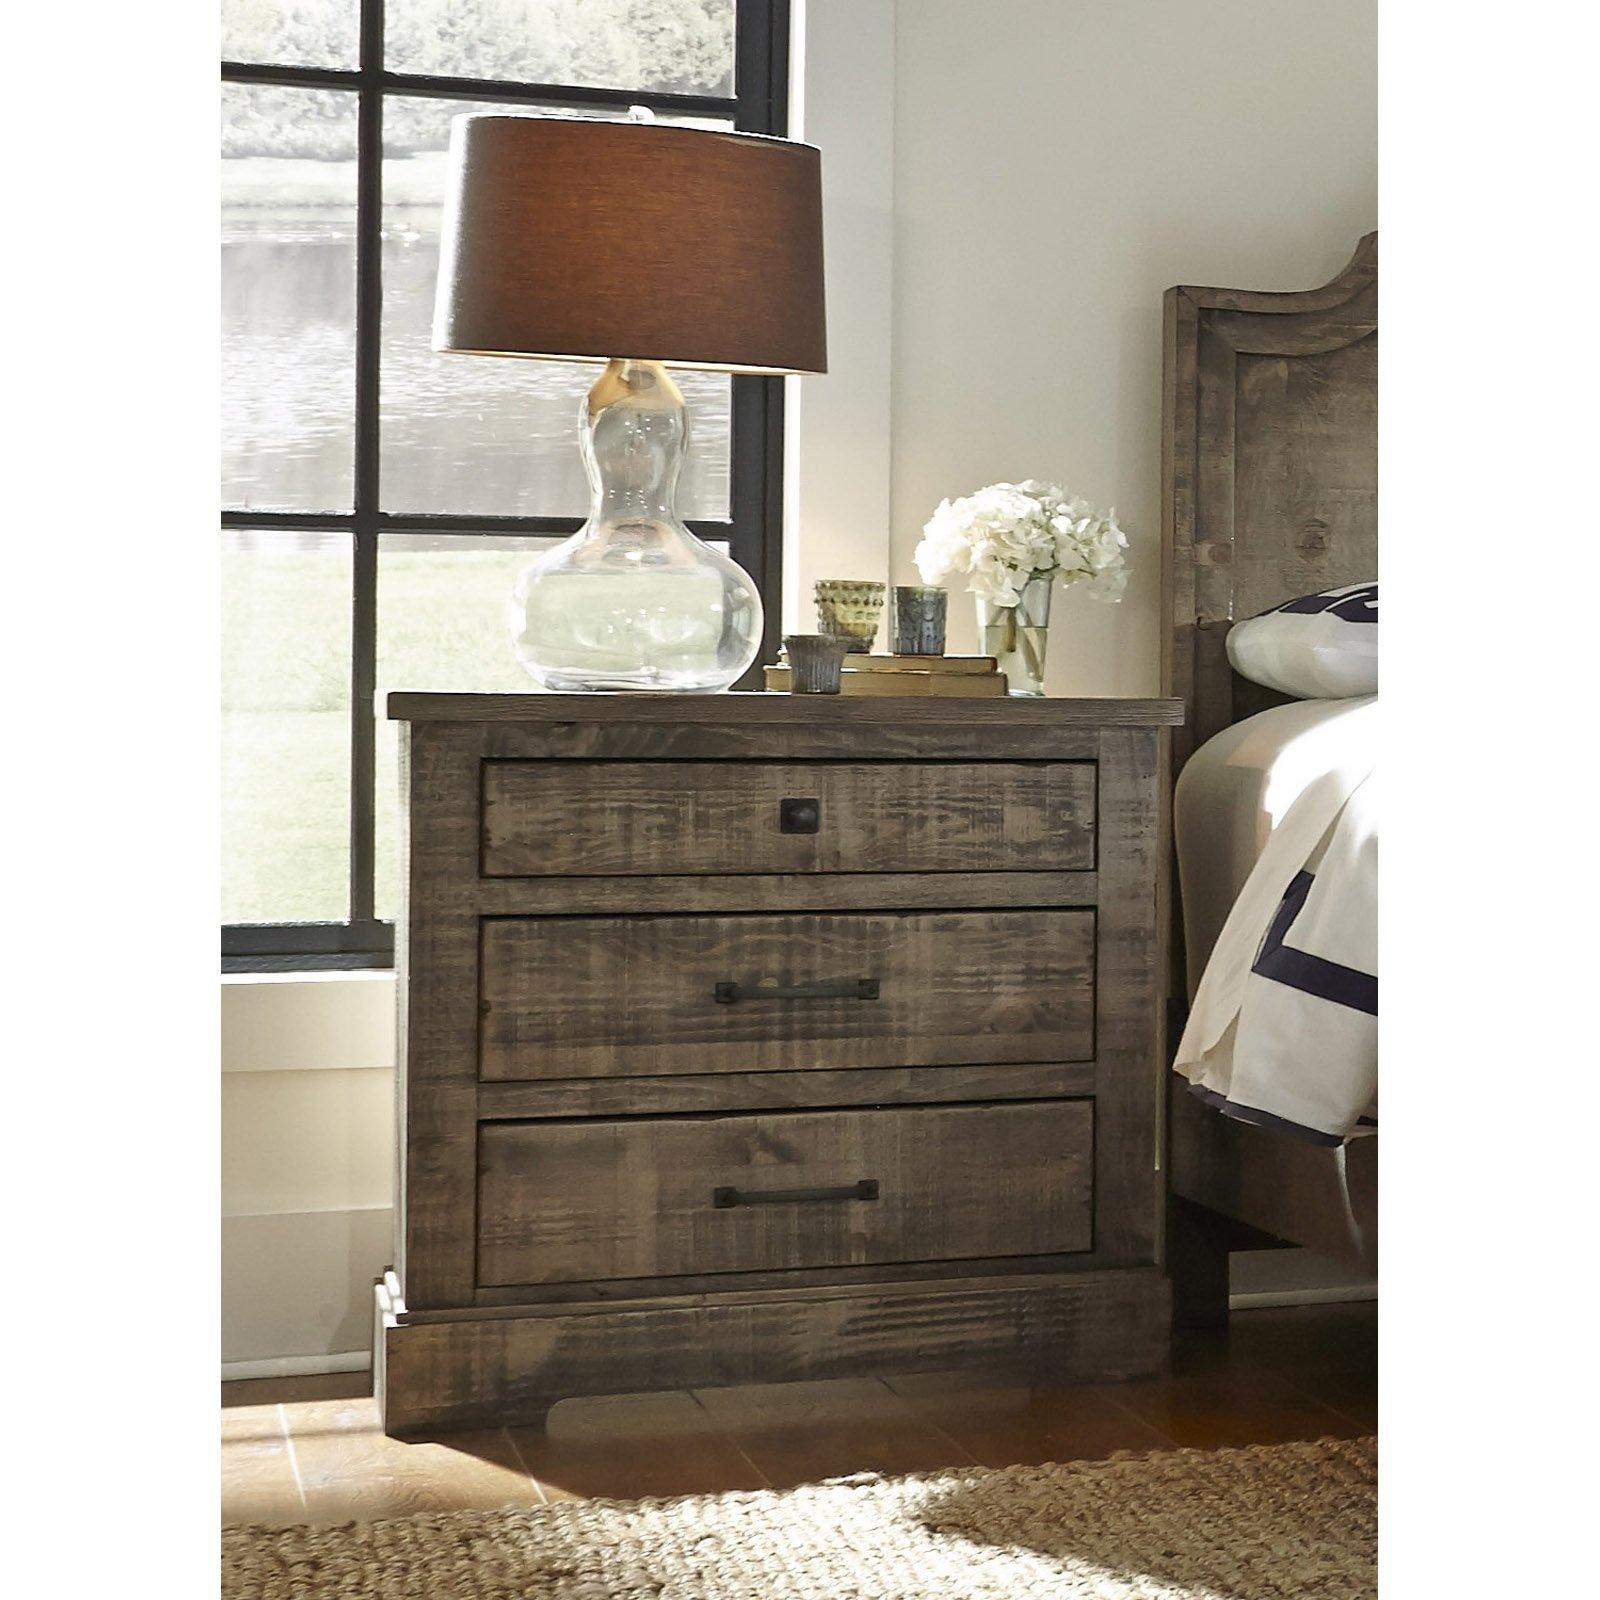 Progressive Furniture Meadow 3 Drawer Nightstand